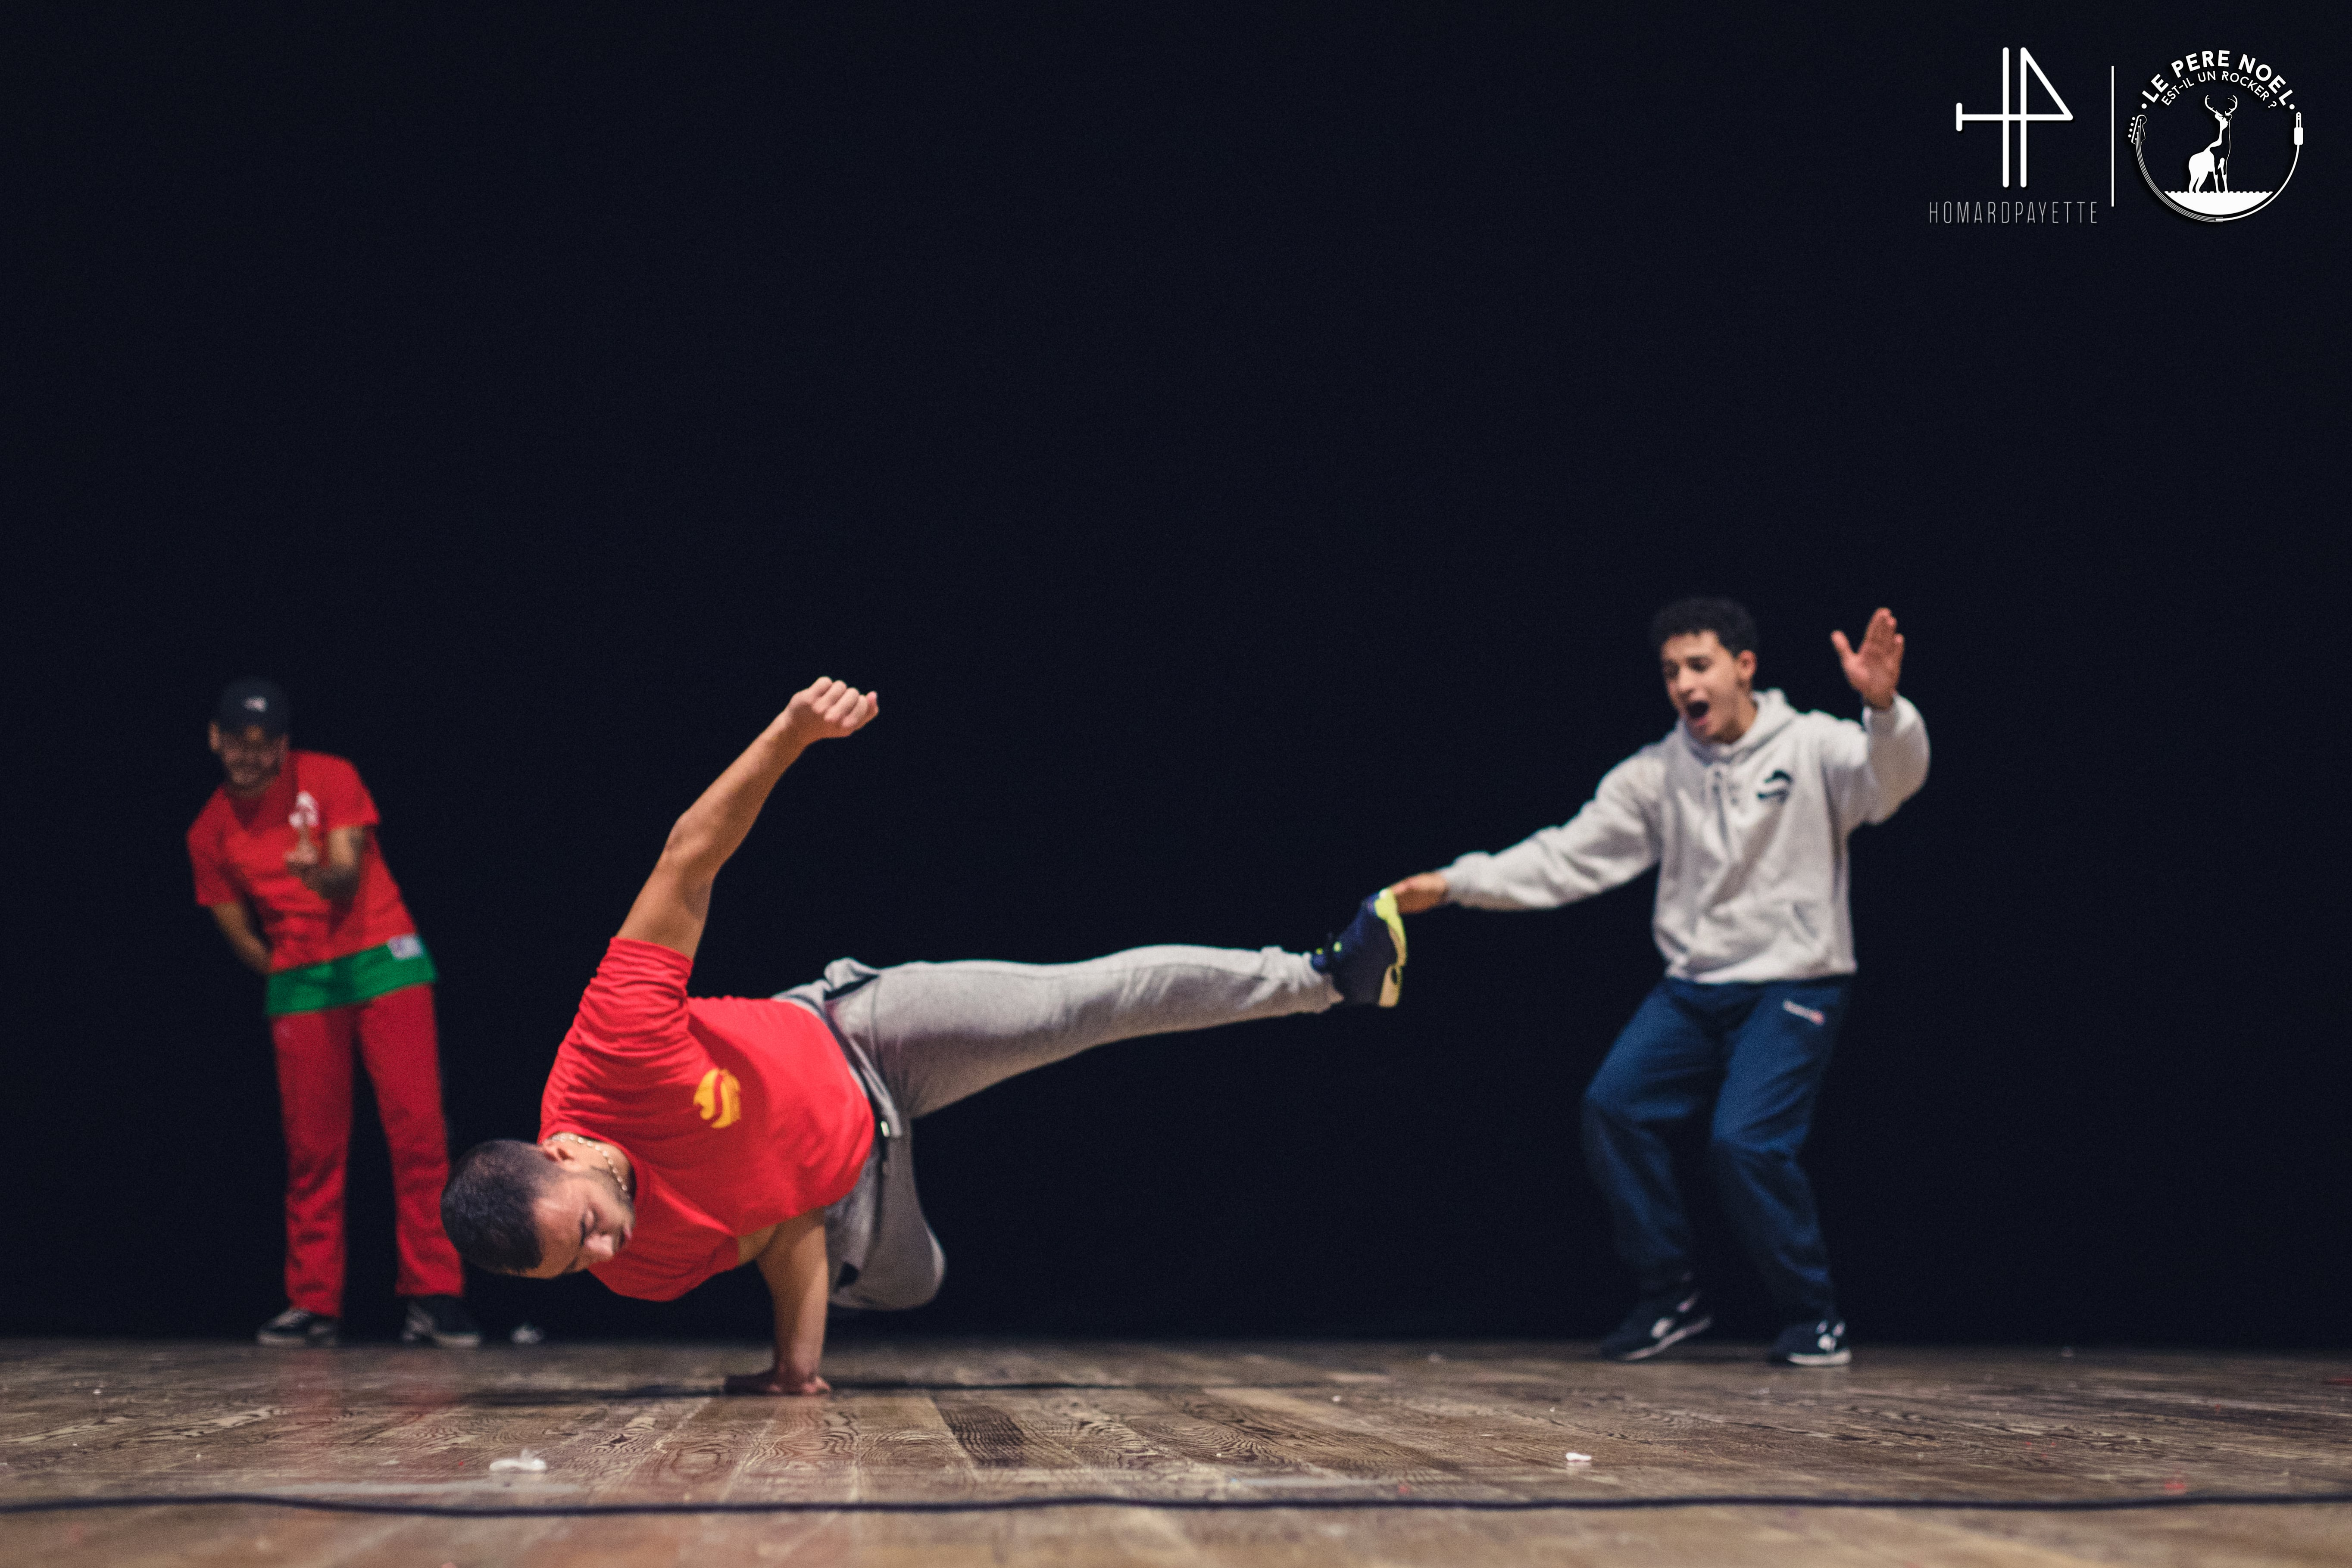 Compagnie danseur professionnel - Streetsmile